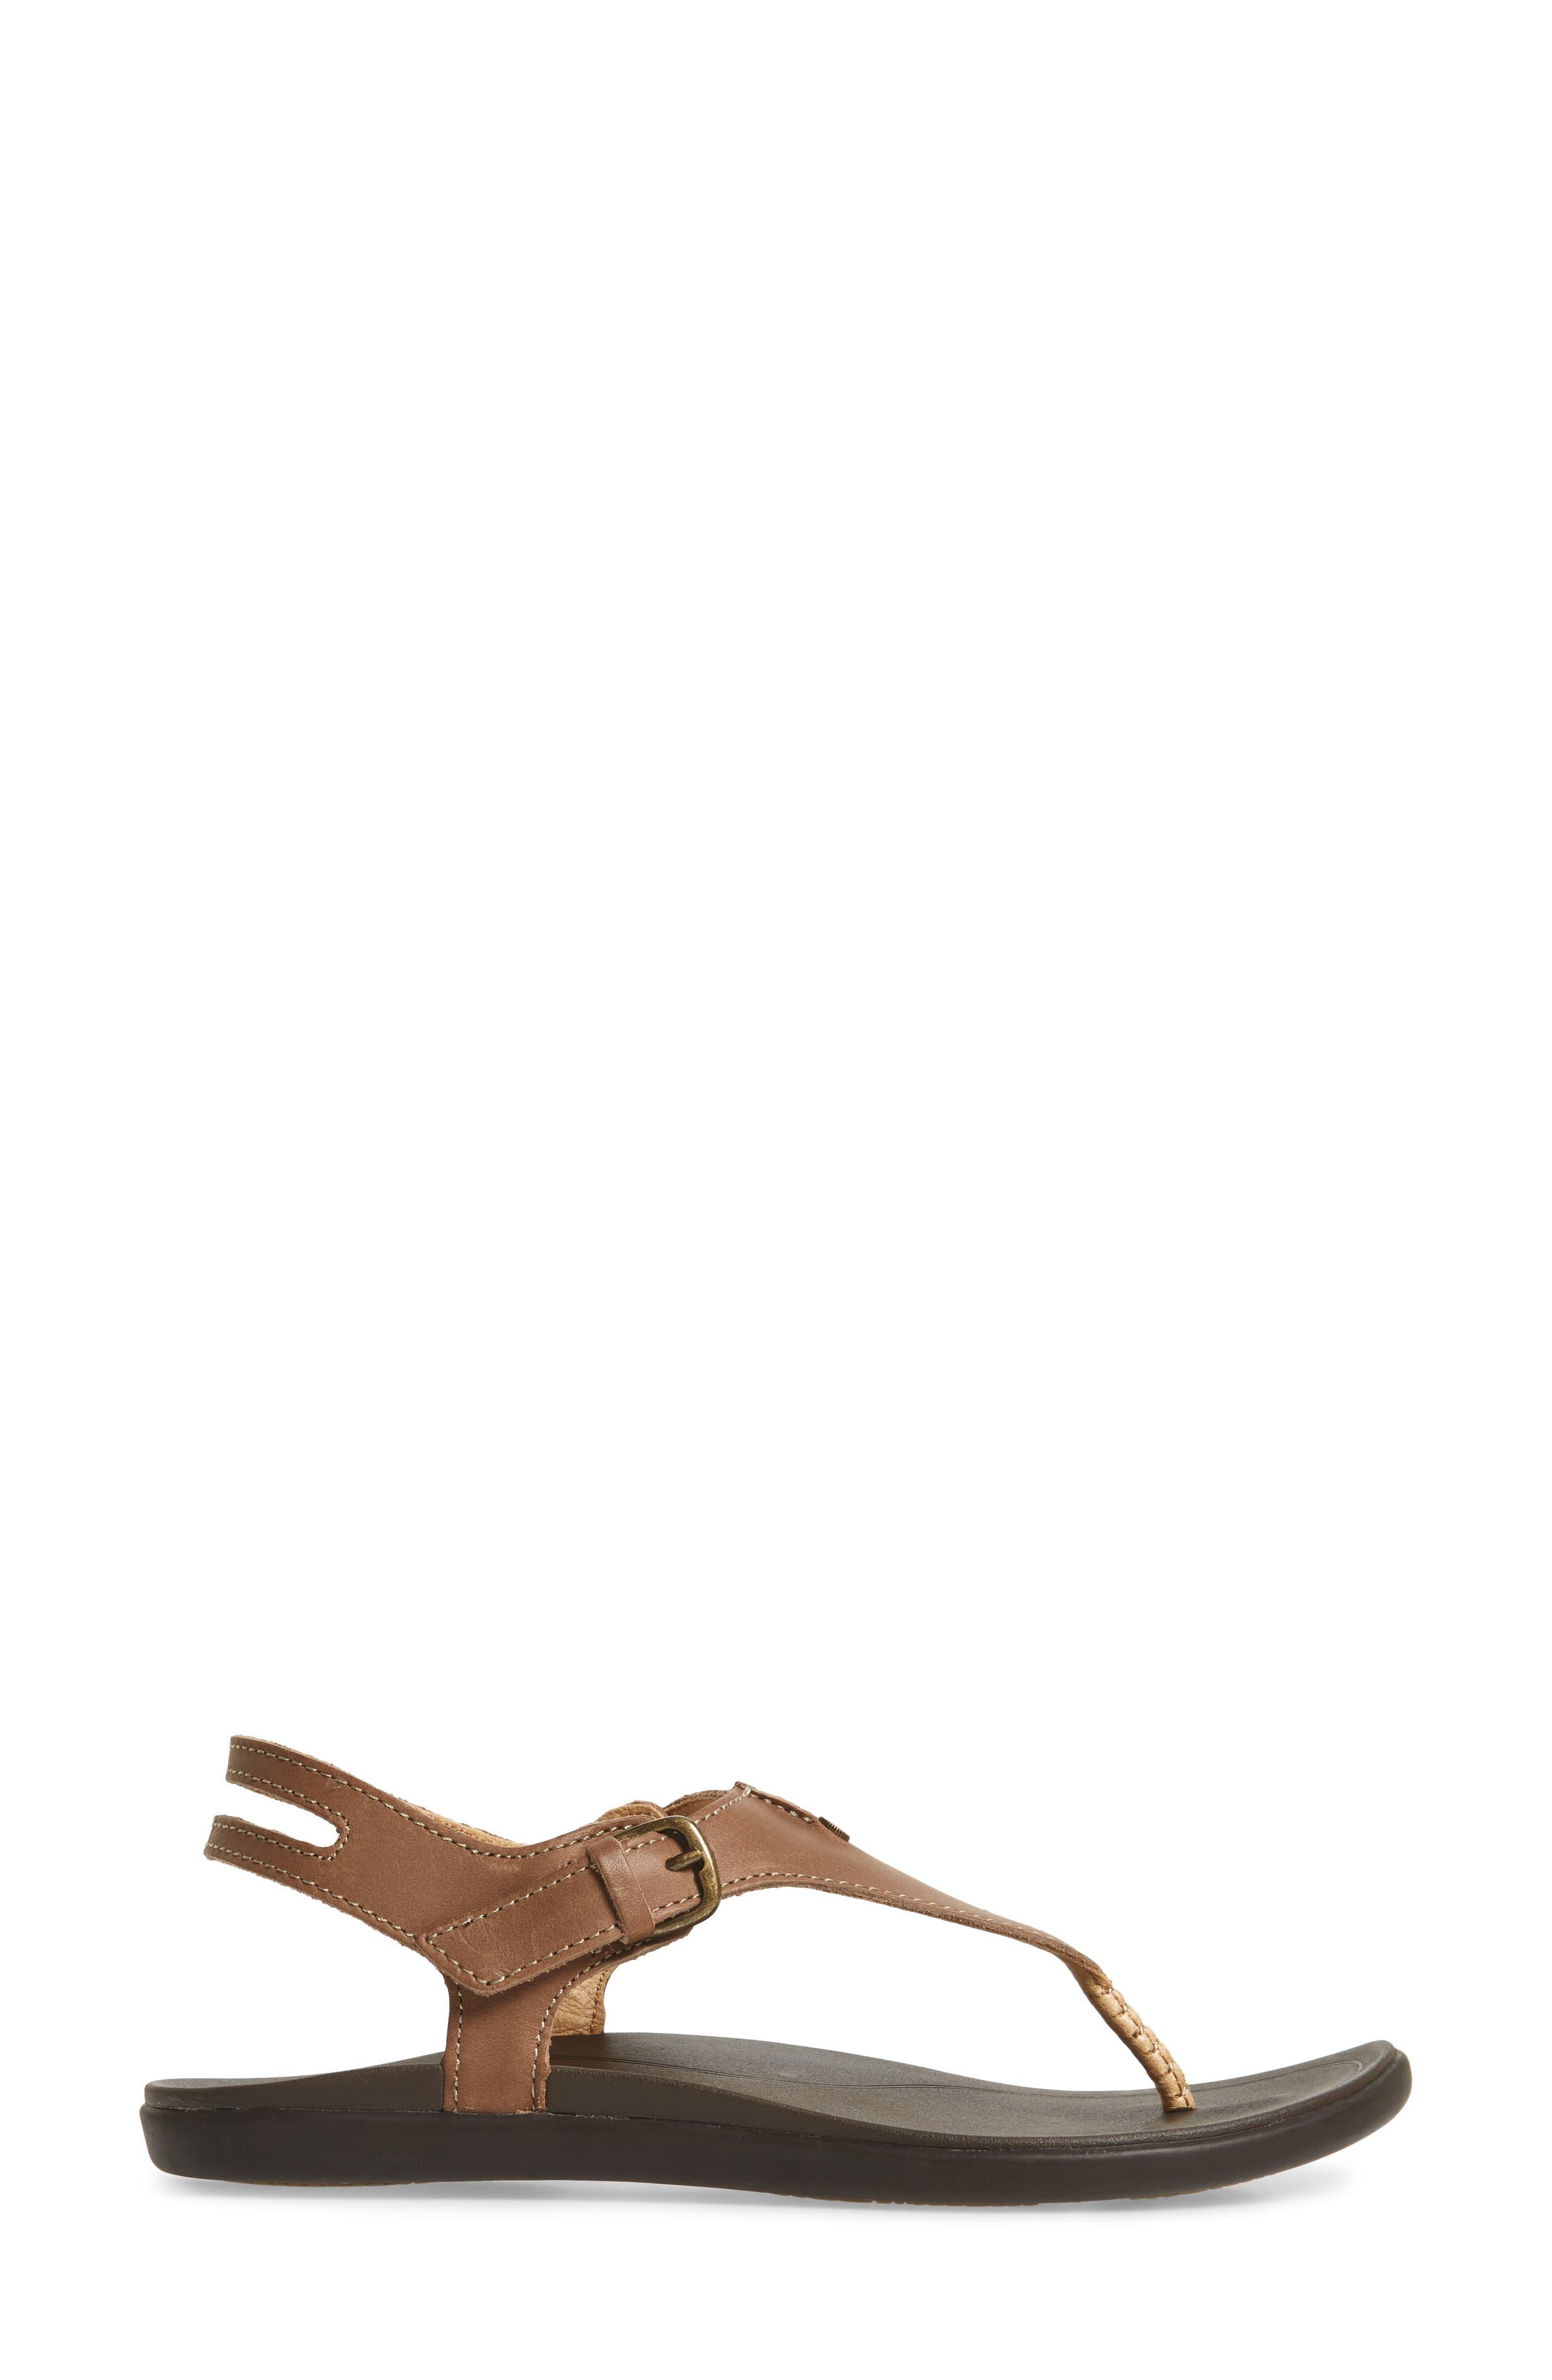 'Eheu V-Strap Sandal,                             Alternate thumbnail 3, color,                             CLAY/ DARK JAVA LEATHER